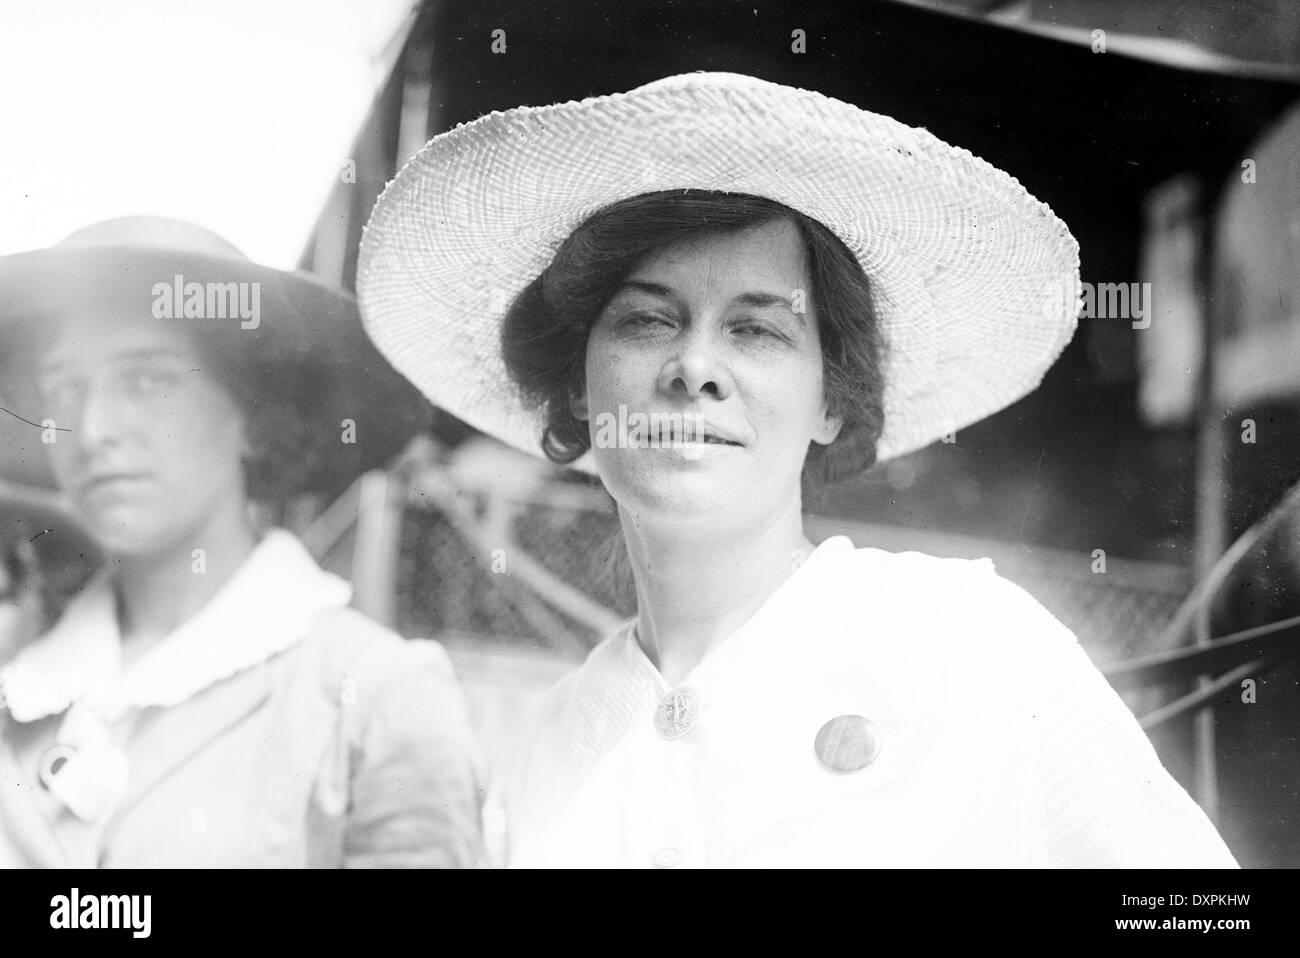 ELISABETH FREEMAN (1876-1942) American suffragette in 1913 - Stock Image